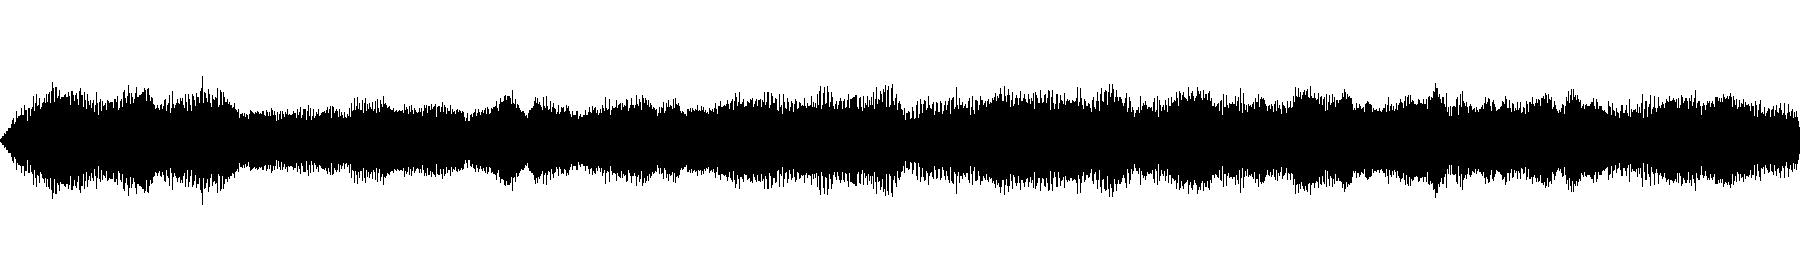 vedh melodyloop 106 dm7 f c a 120bpm